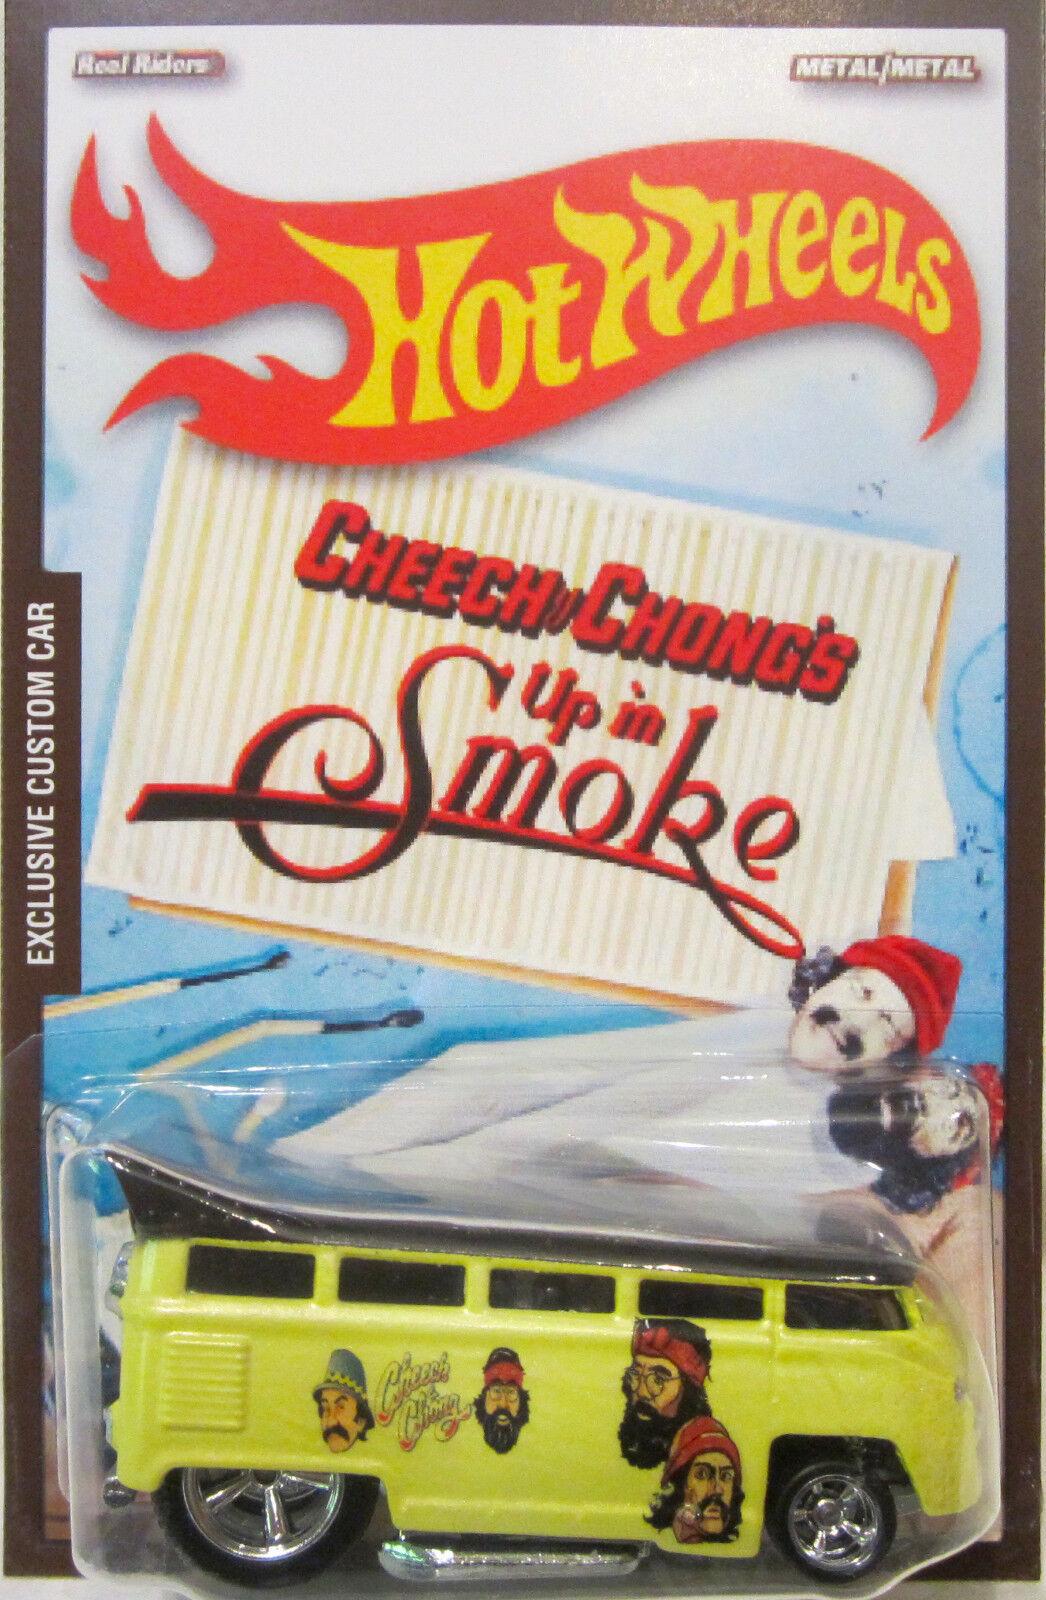 Hot Wheels Personalizado Vw Drag Bus Cheech & Chong Real Riders 1 5 hecho